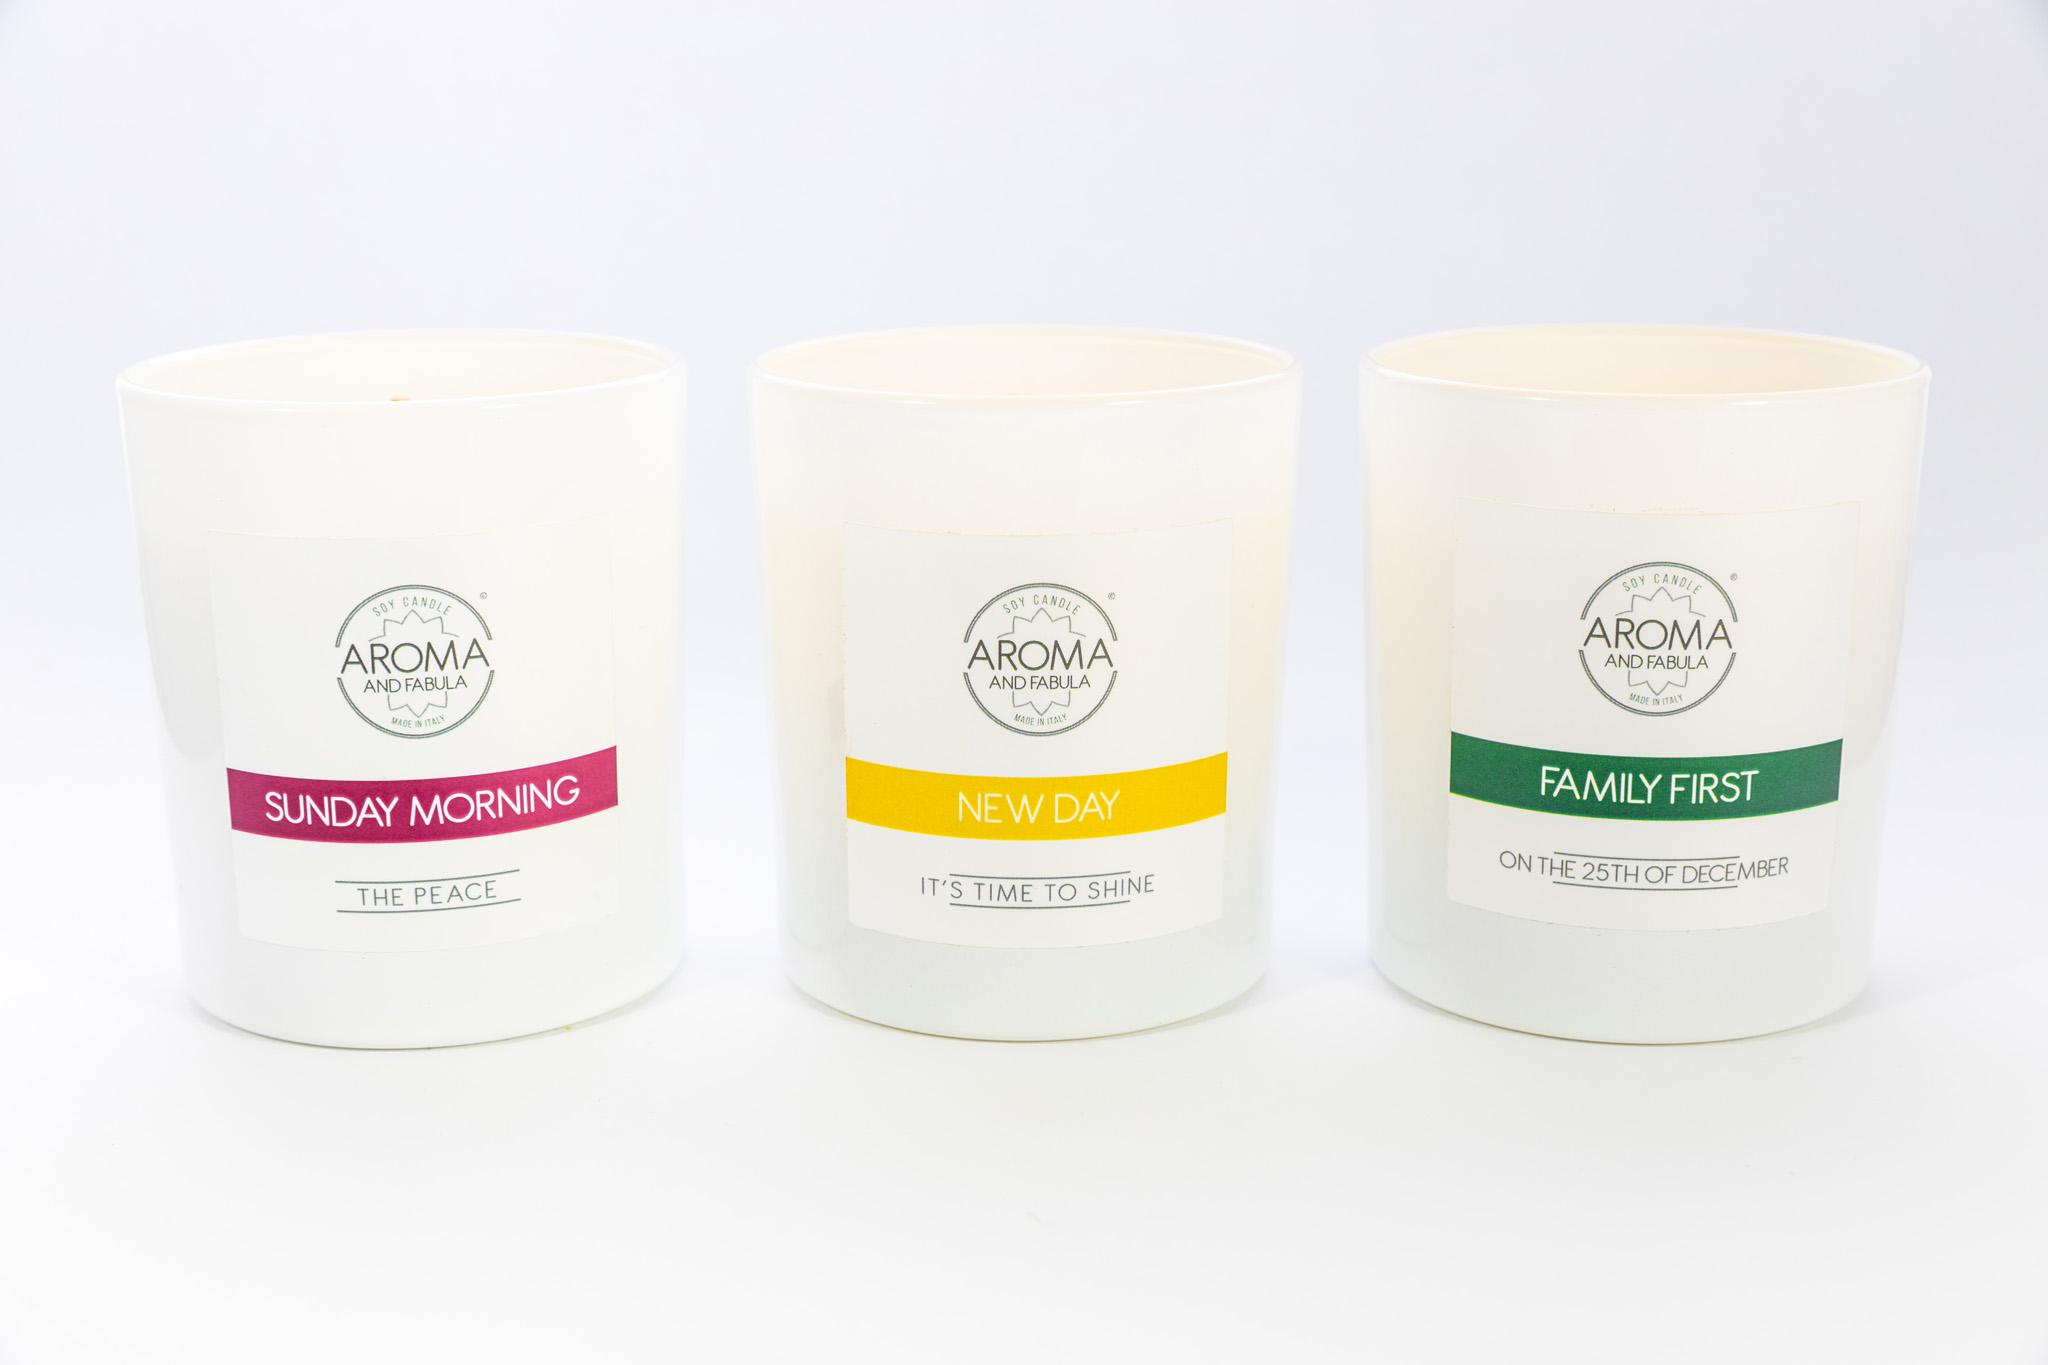 aroma-and-fabula-artisan-premium-candle